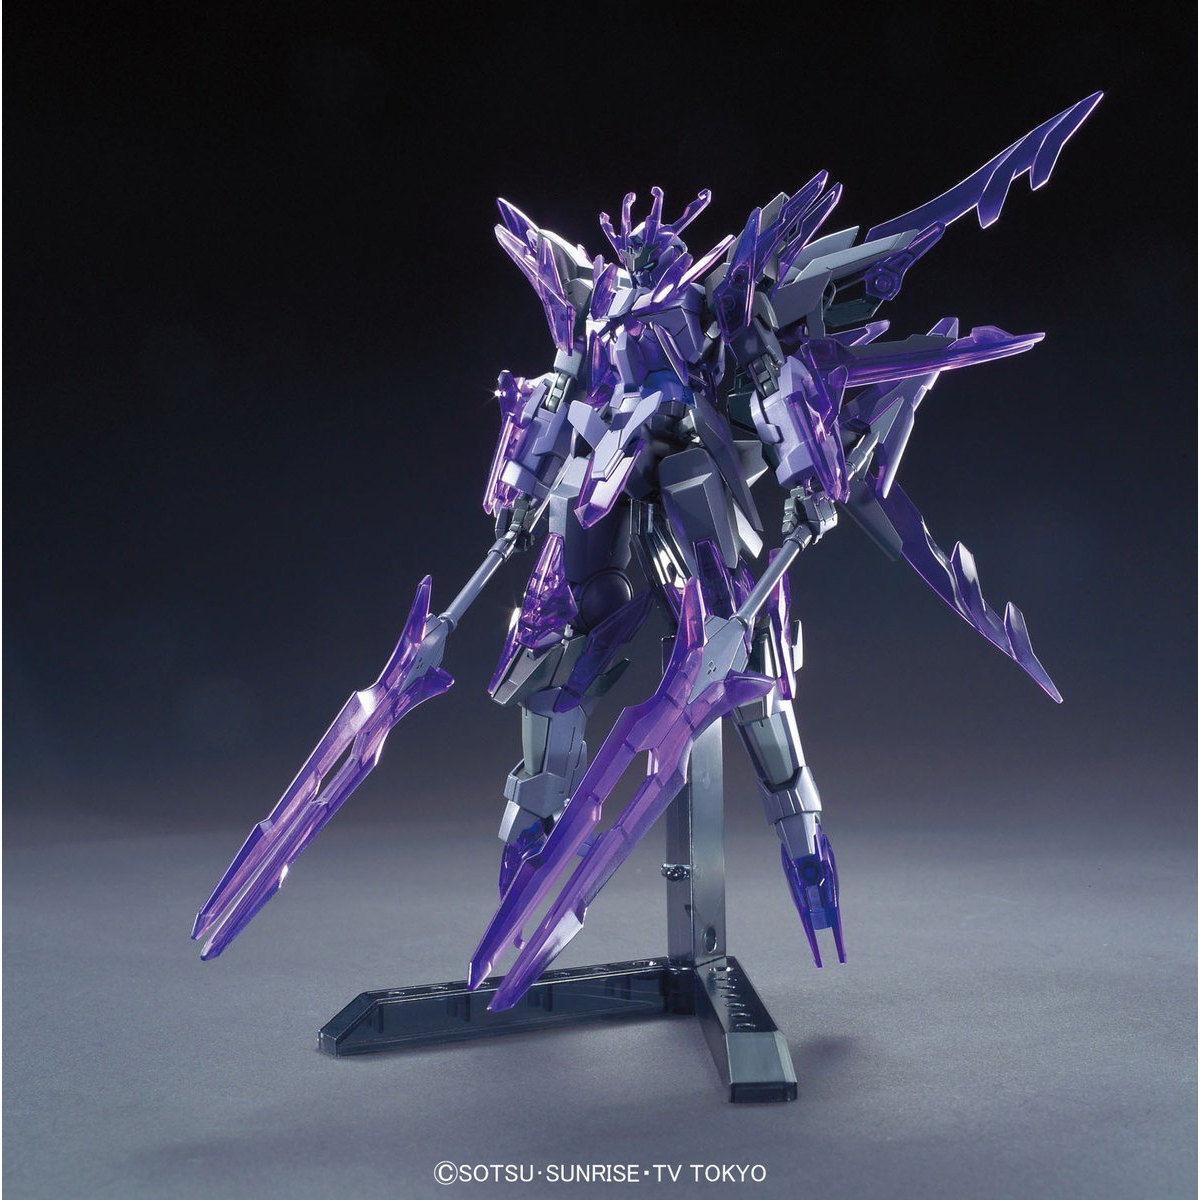 37677HGBF 1/144 GN-10000 トランジェントガンダムグレイシャー [Transient Gundam Glacier] 0211947 5055443